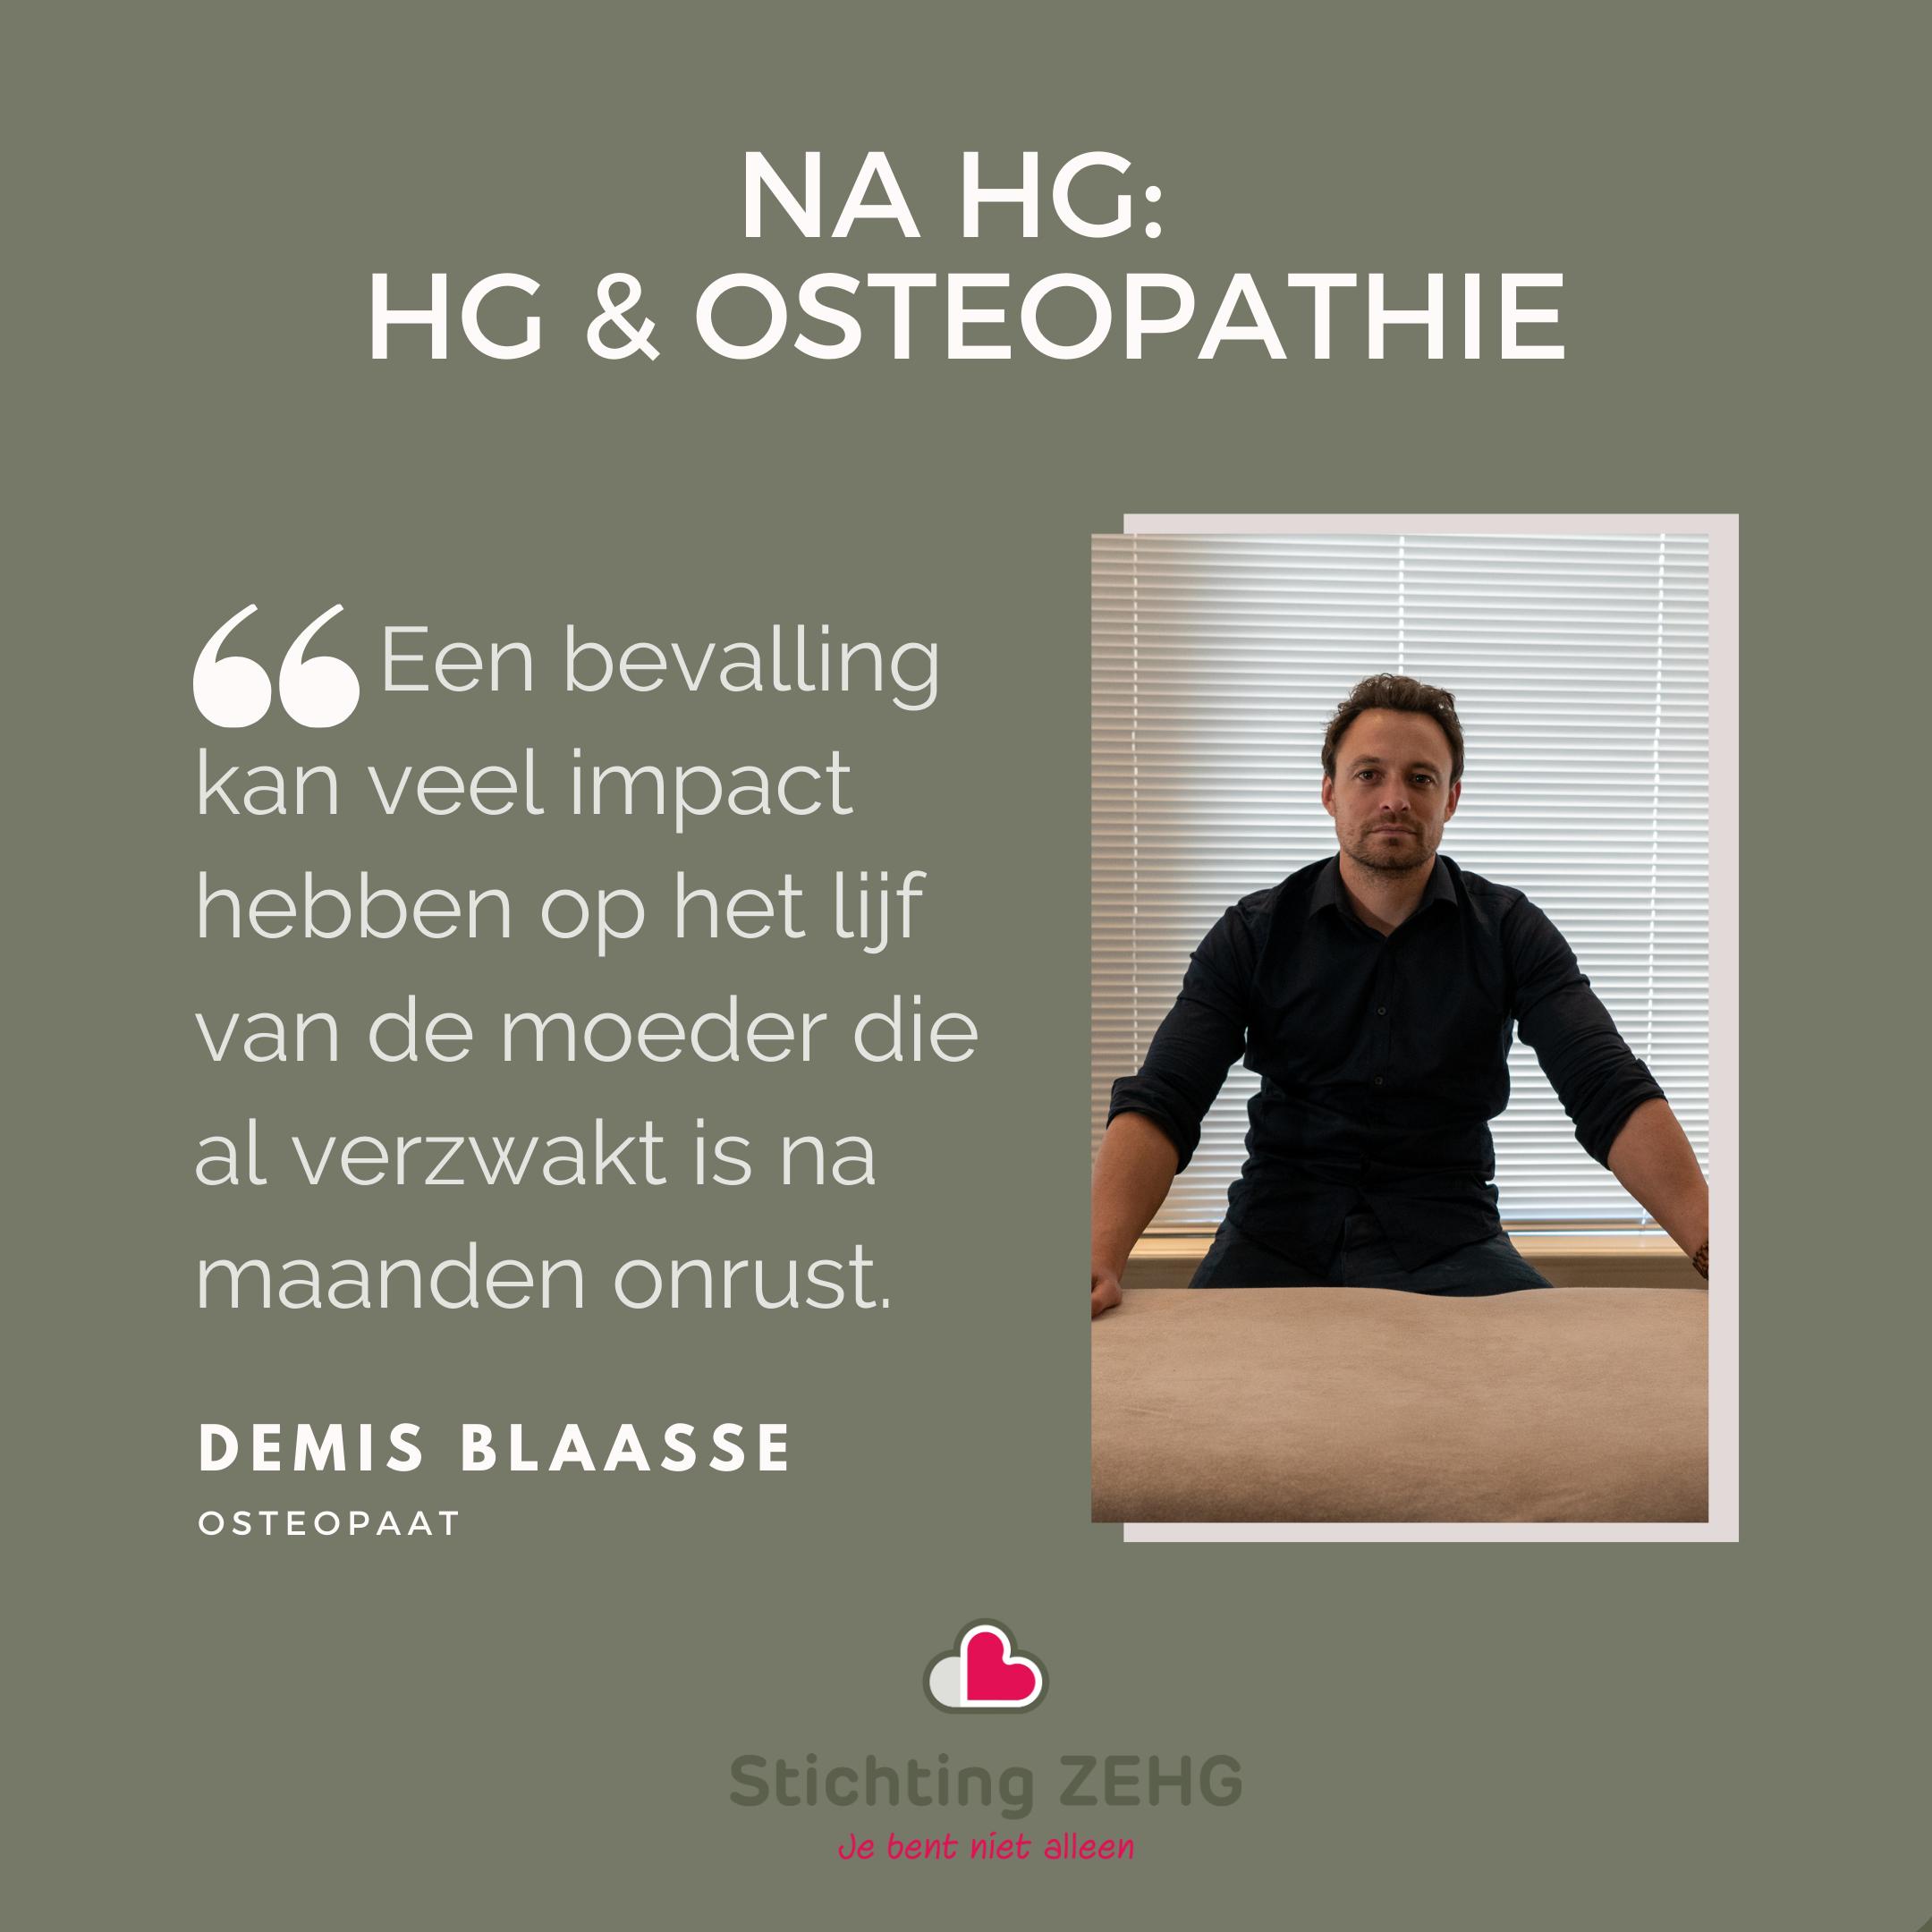 Herstel Na HG II: HG & Osteopathie